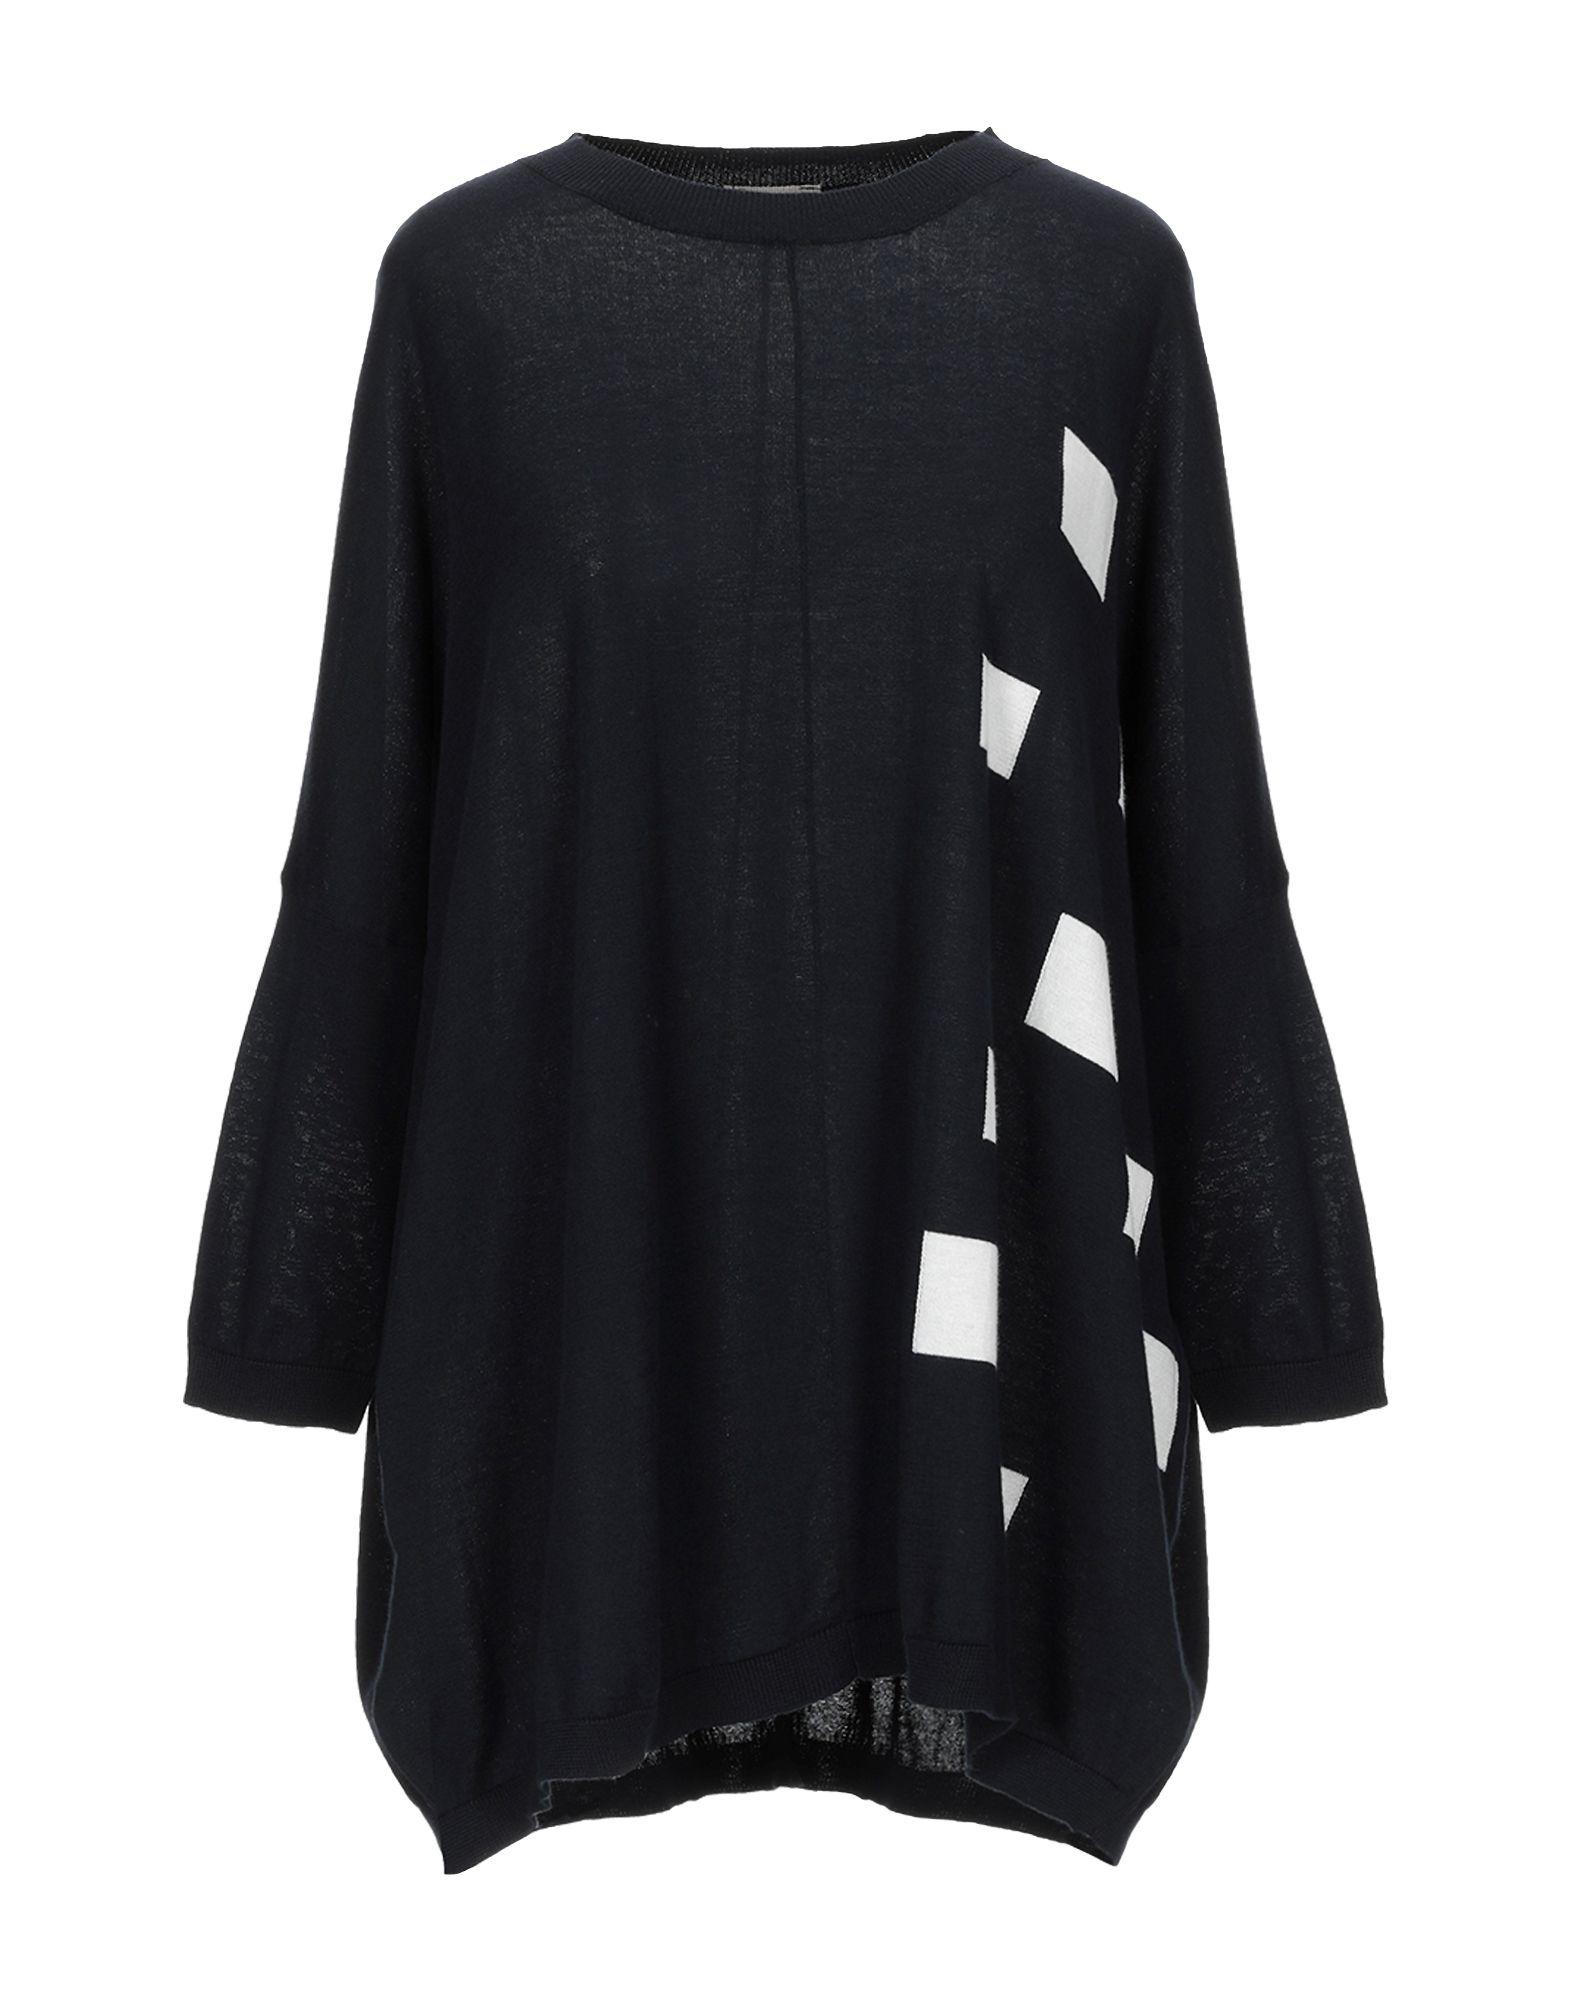 KNIT KNIT Свитер grommet lace up marled knit crop sweatshirt